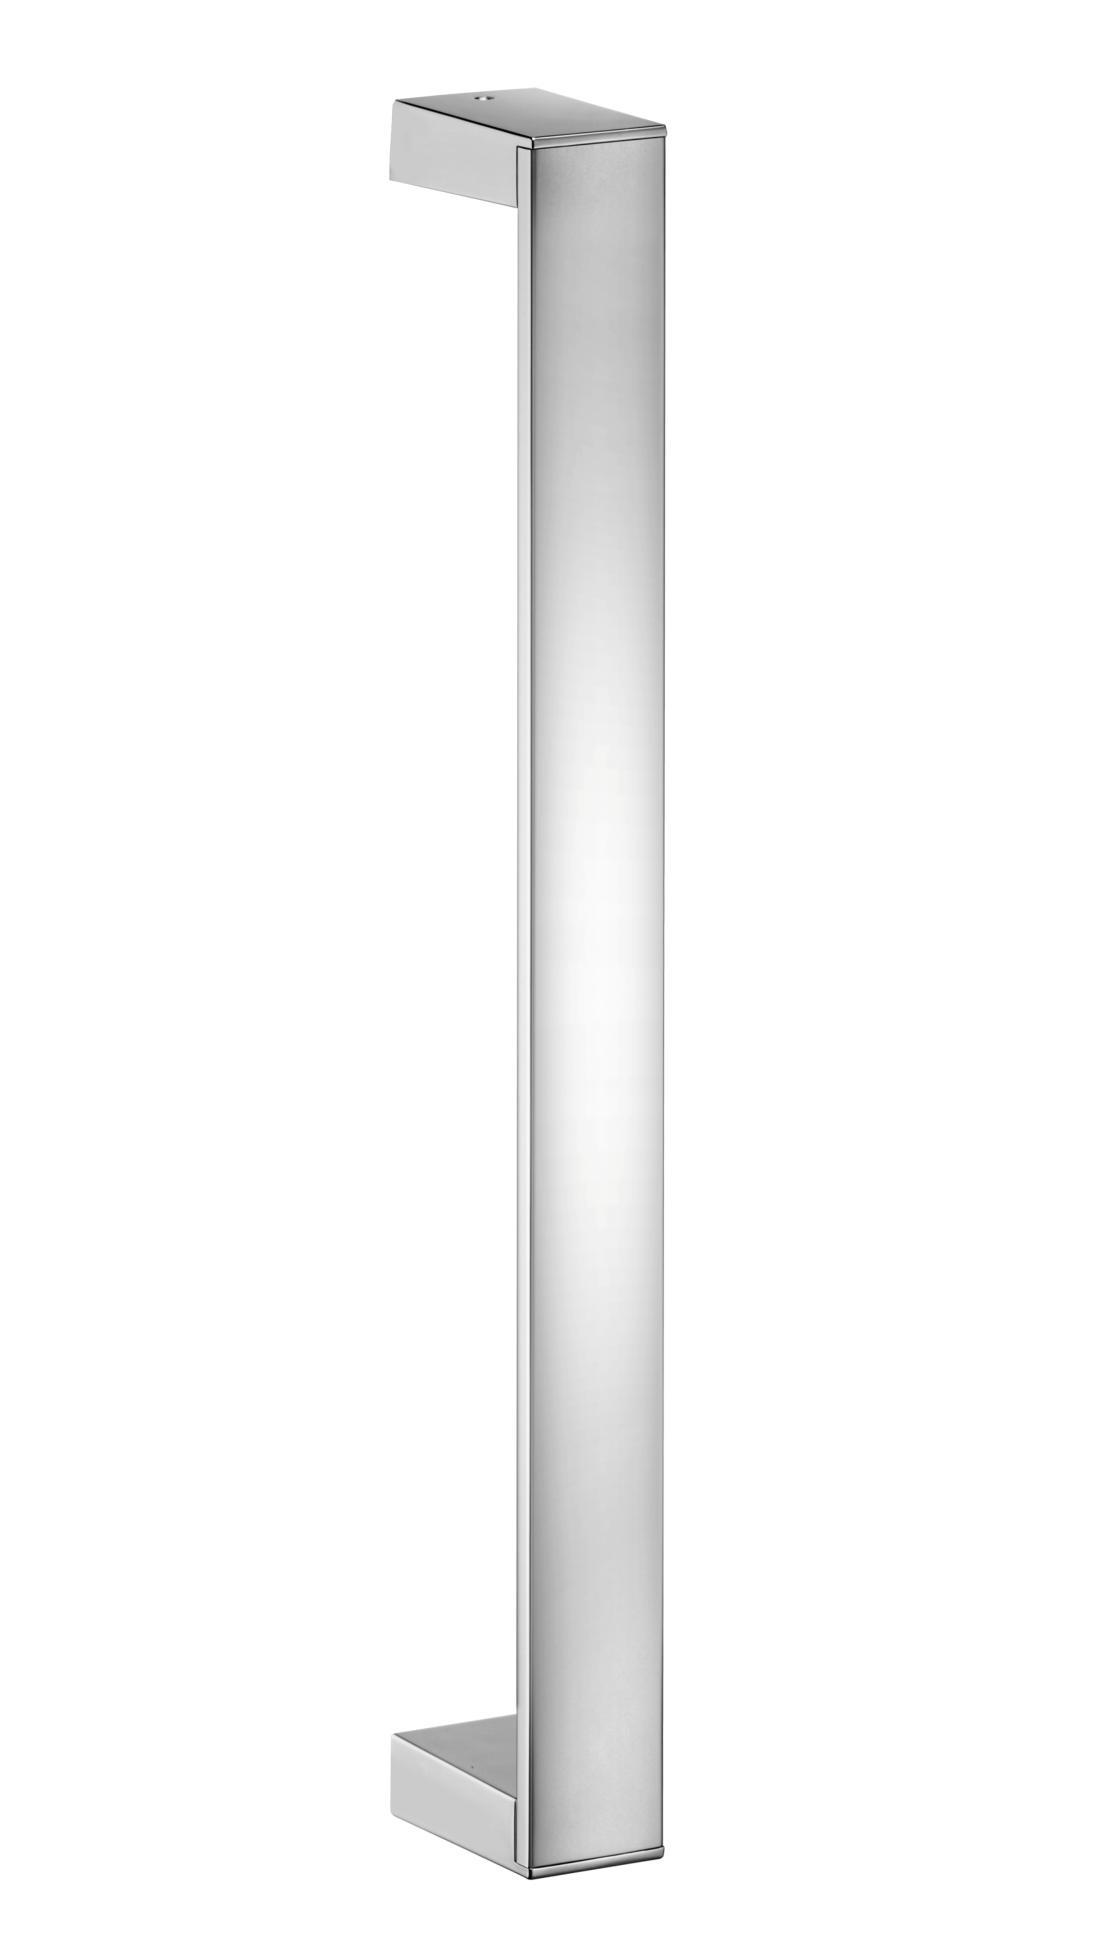 Keuco Edition 11 Handtuchhalter chrom